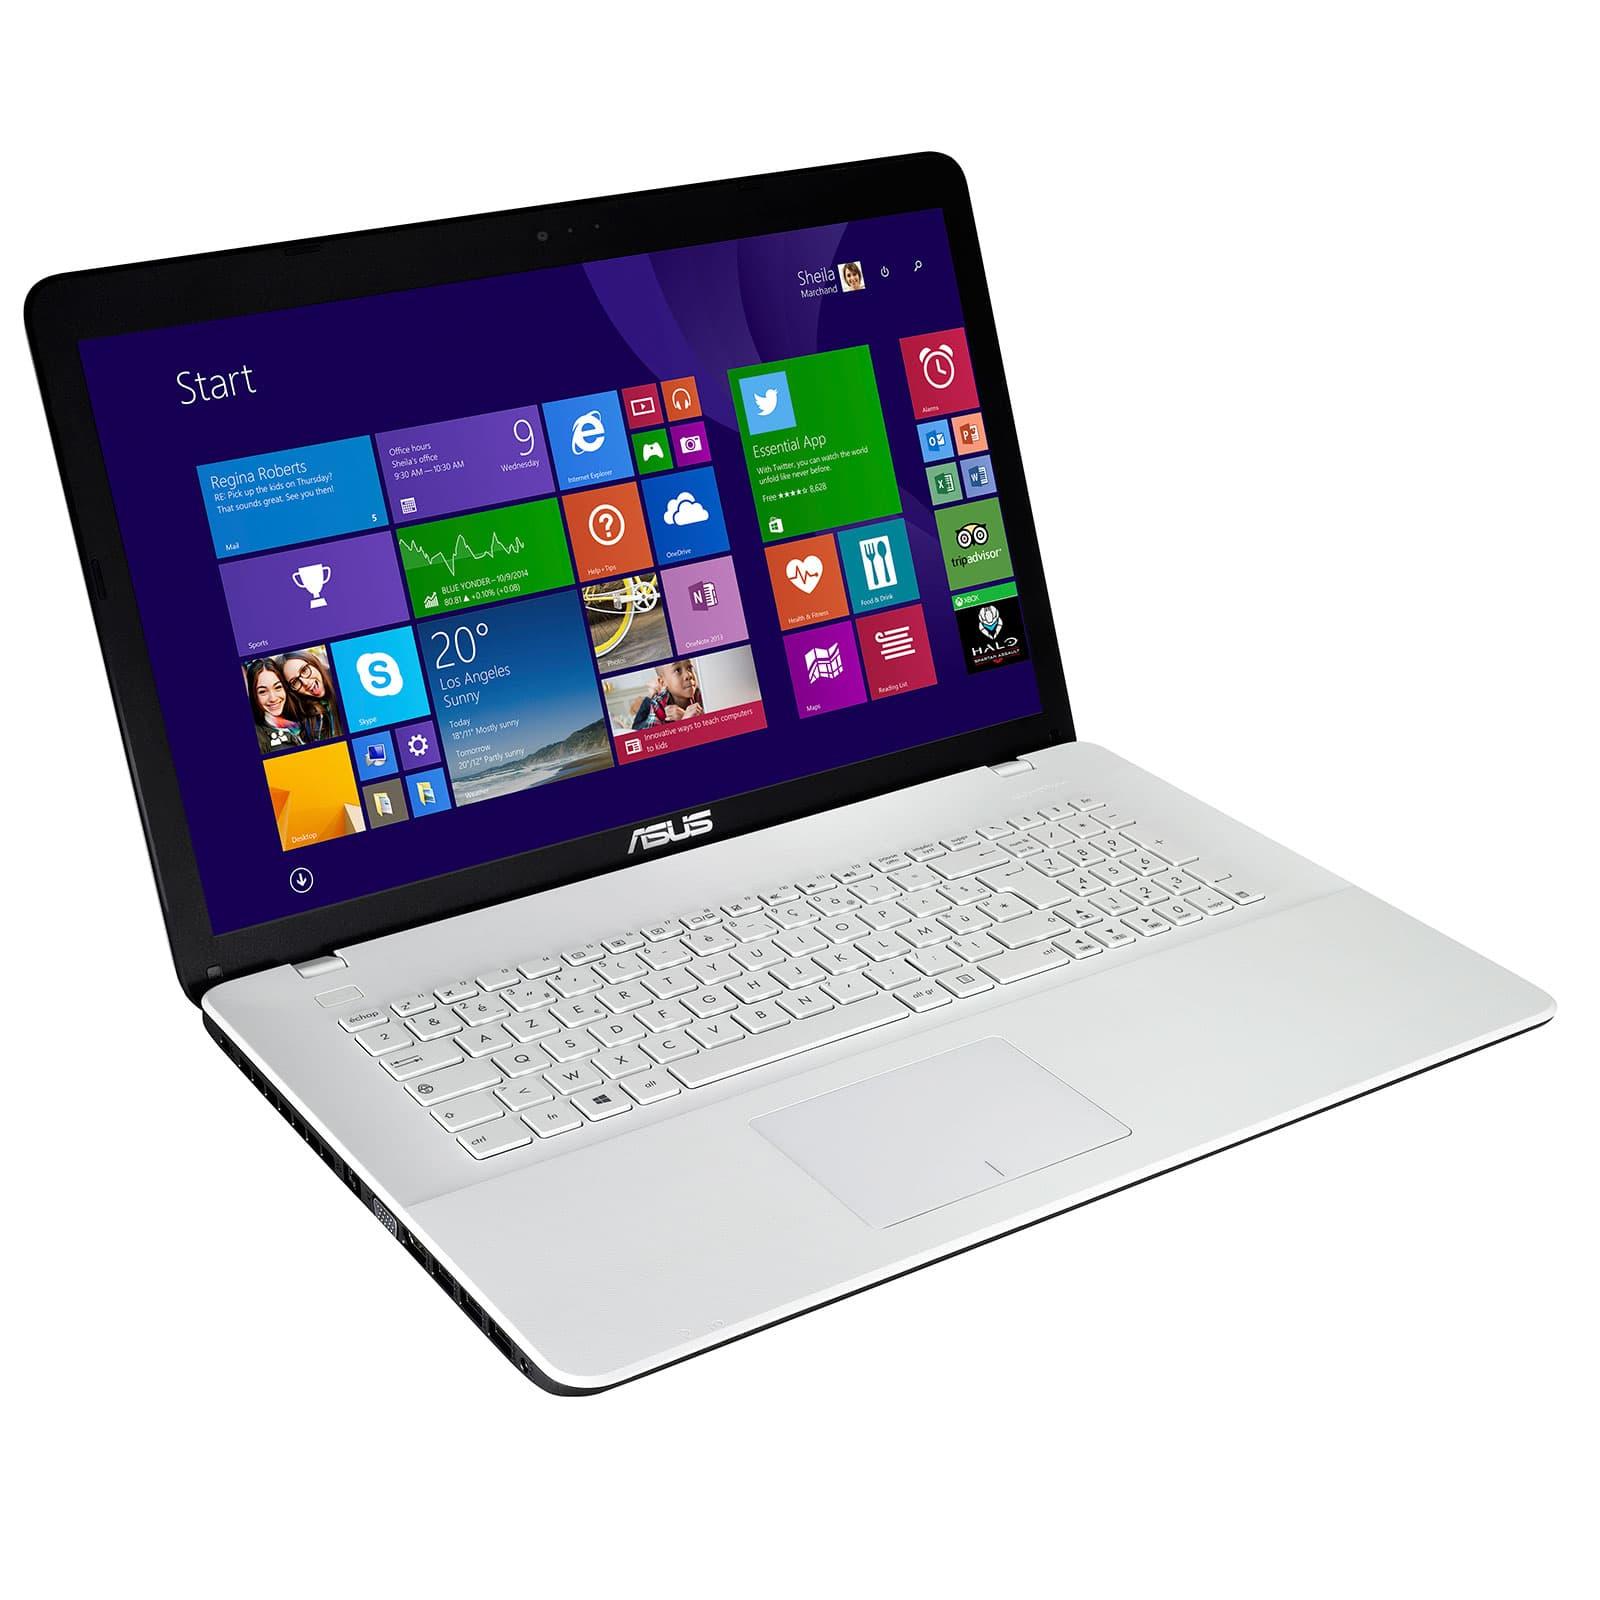 "<span class=""tagtitre"">Promo 419€ - </span>Asus X751LD-TY082H, 17.3"" blanc avec Core i5, GeForce 820M"